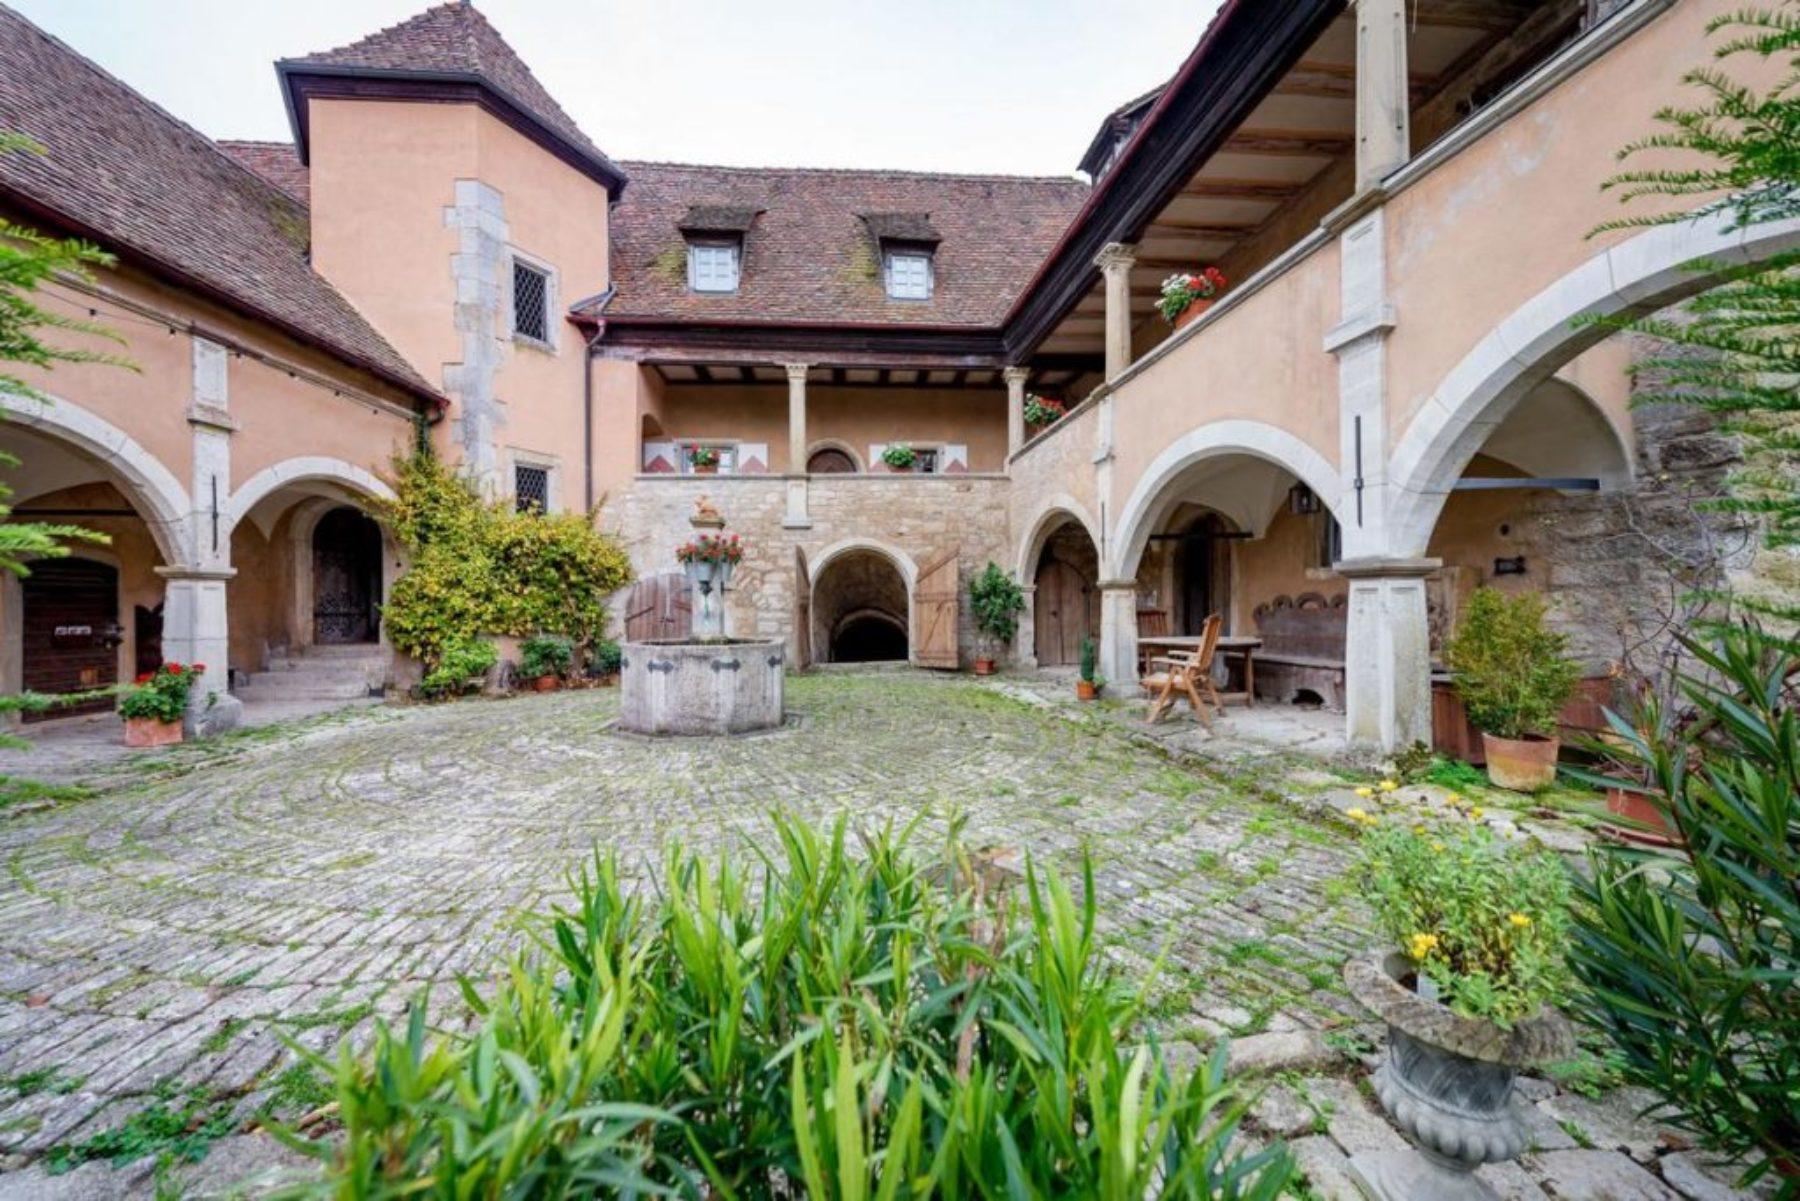 Das Schloss - Café, Feriendomizil und Veranstaltungsort